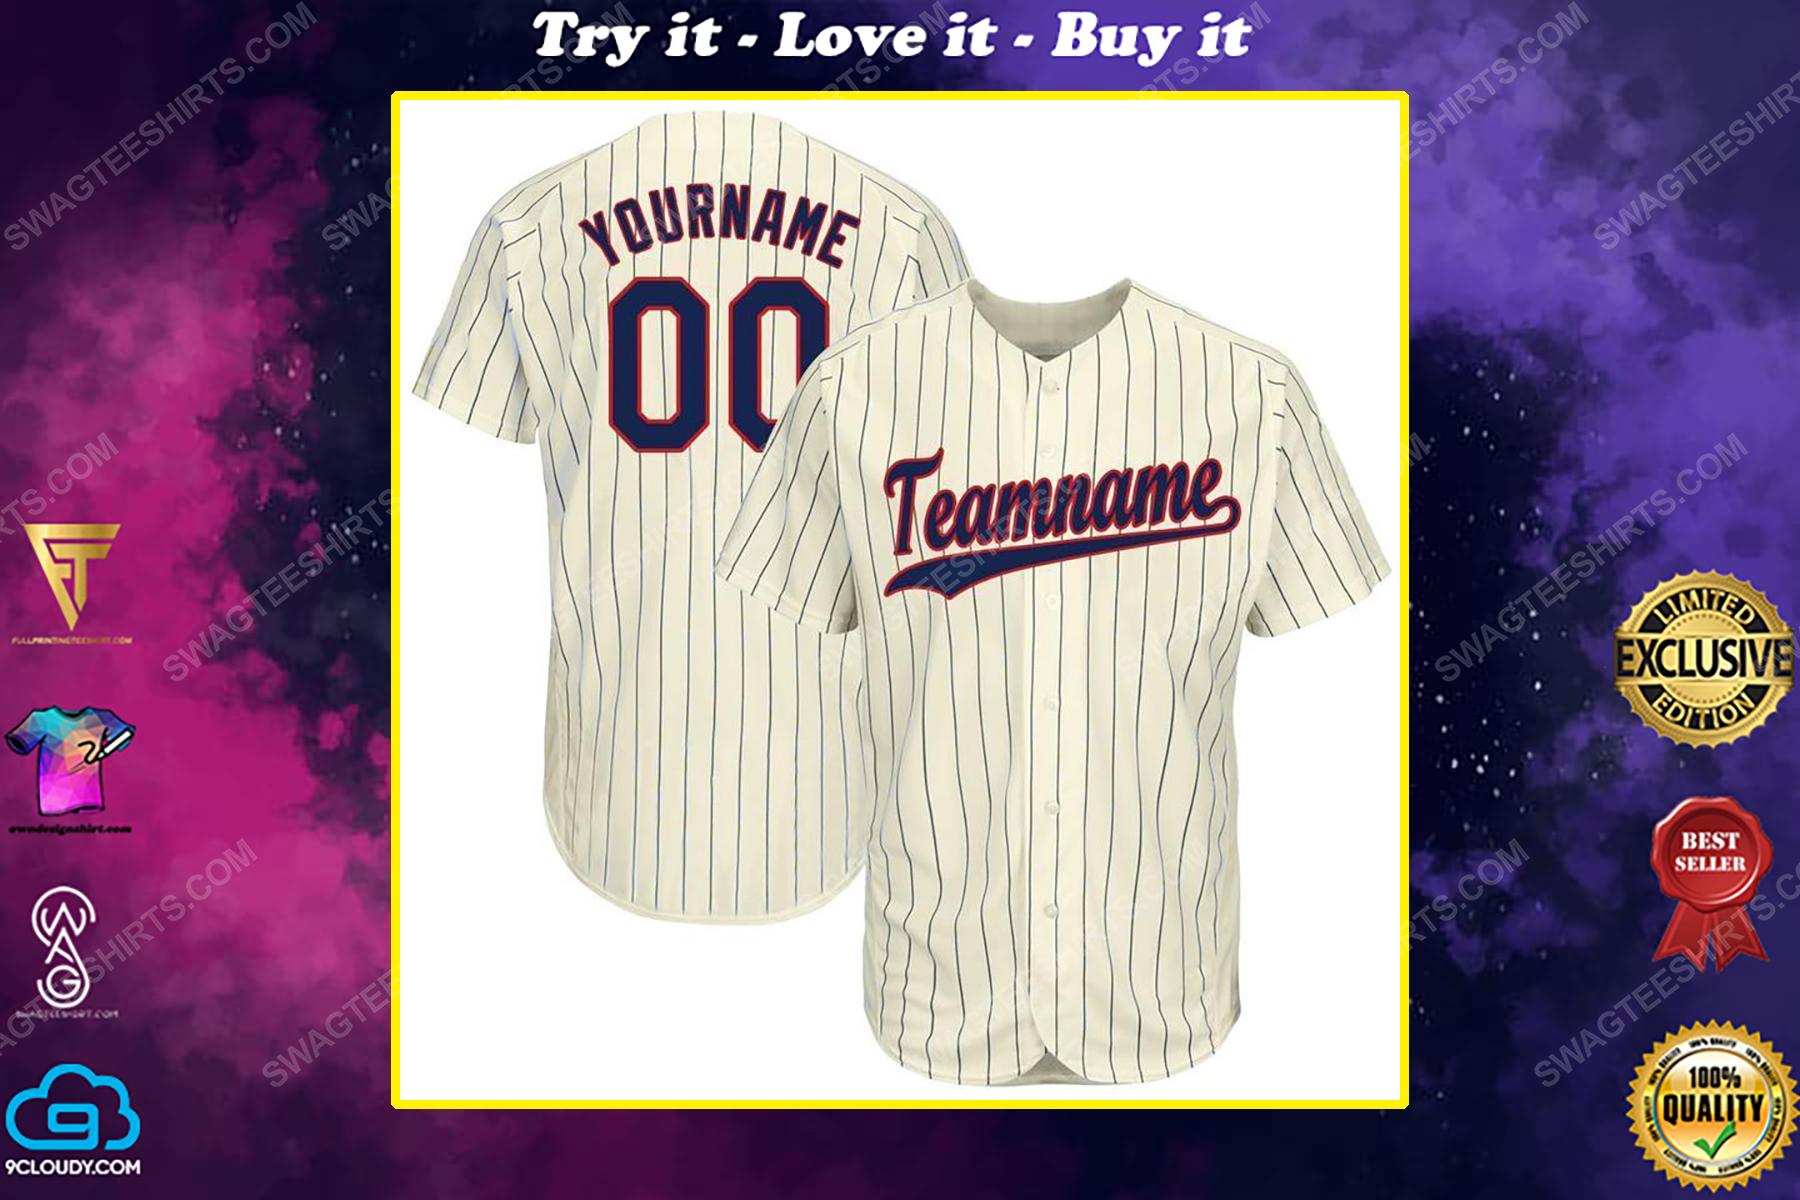 Custom team name minnesota twins baseball full printed baseball jersey